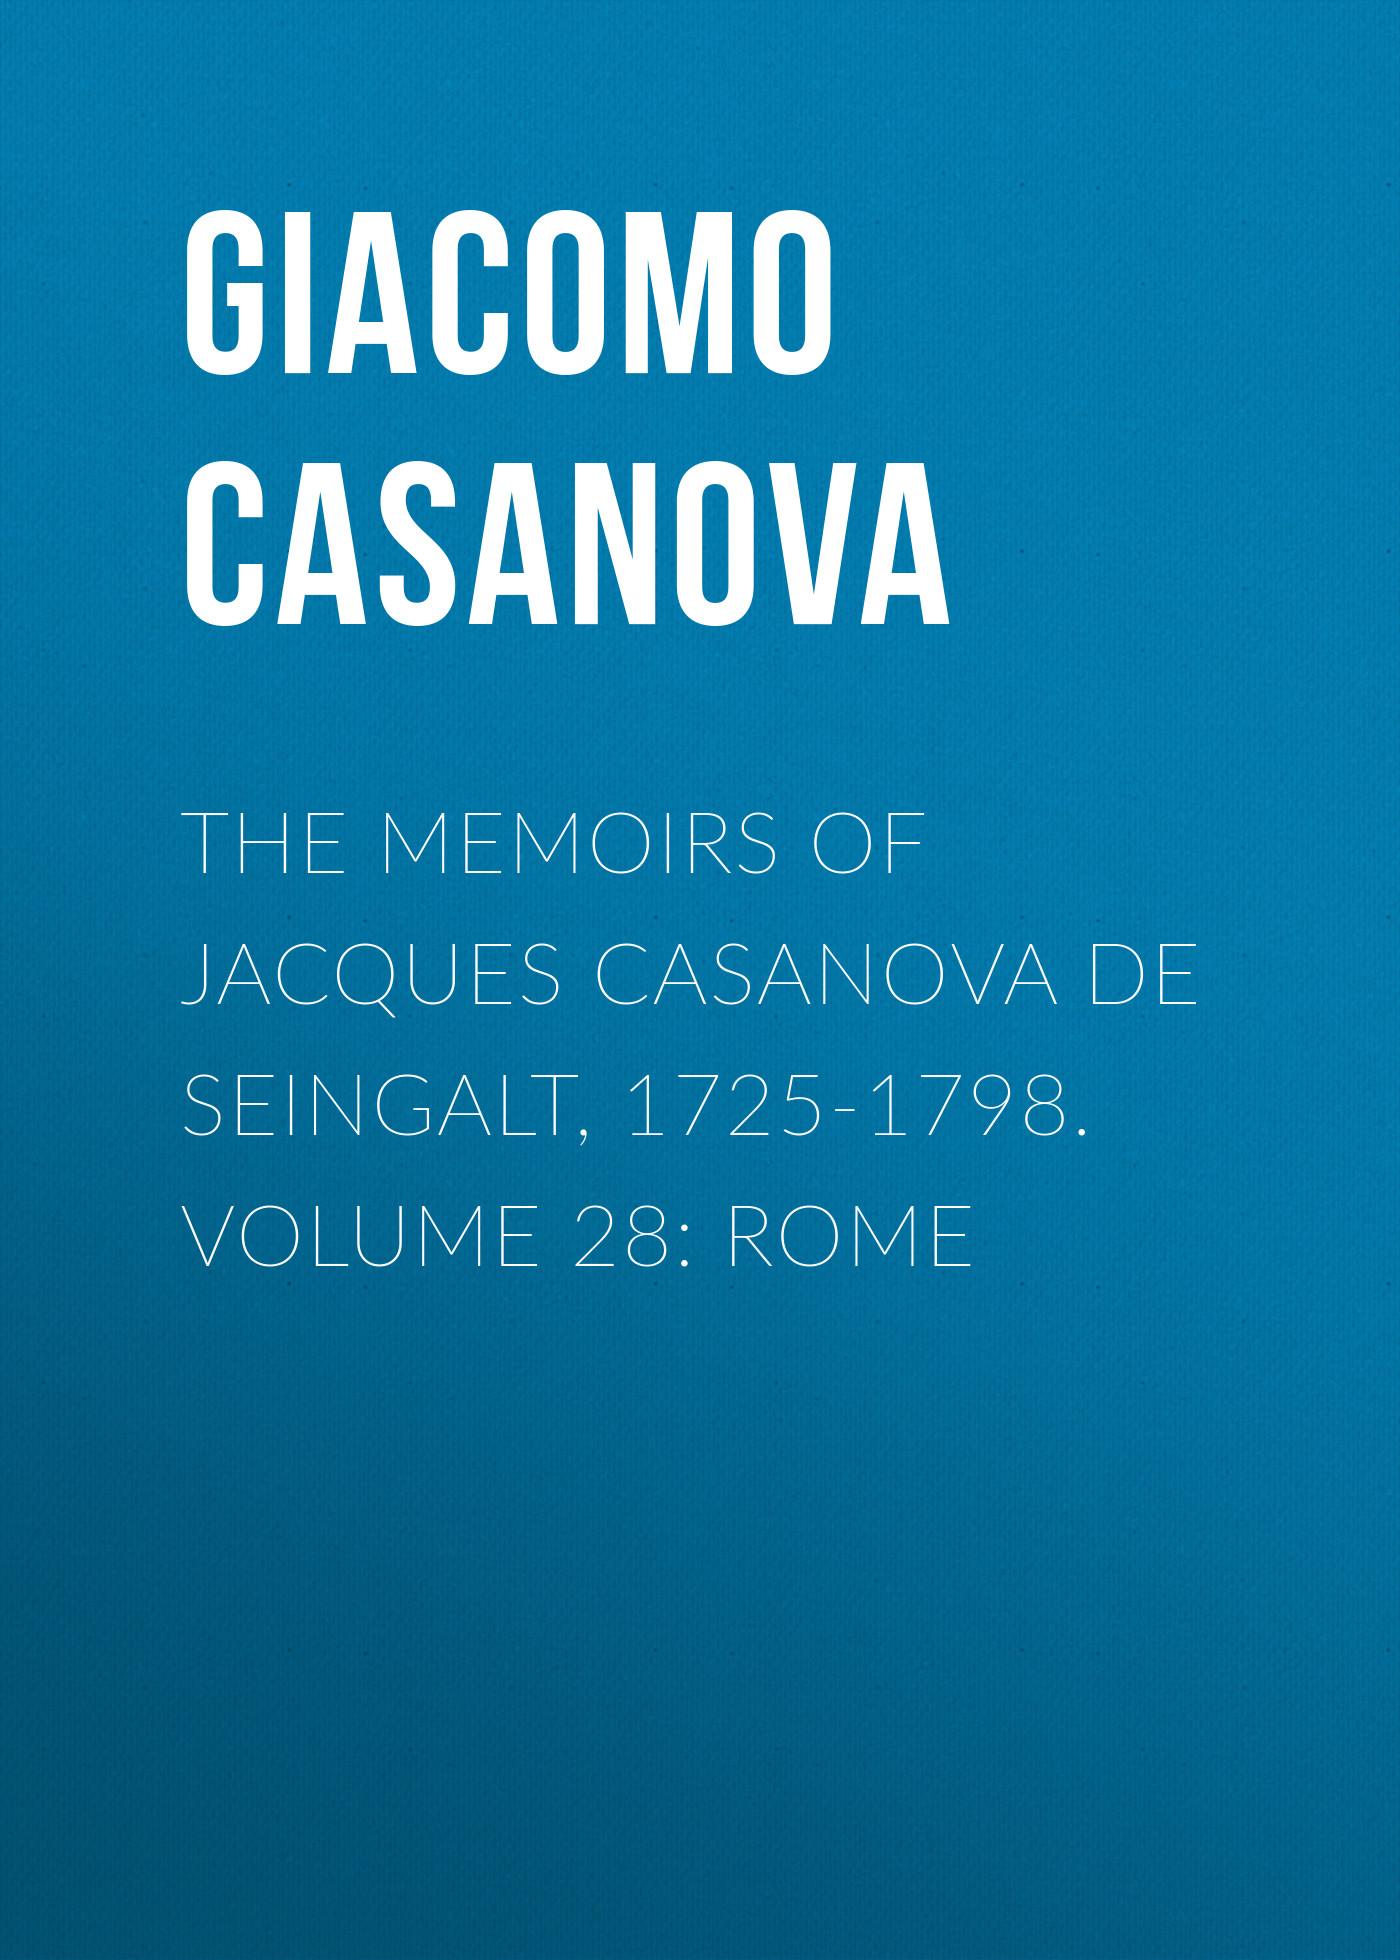 Giacomo Casanova The Memoirs of Jacques Casanova de Seingalt, 1725-1798. Volume 28: Rome giacomo casanova the memoirs of jacques casanova de seingalt 1725 1798 volume 20 milan